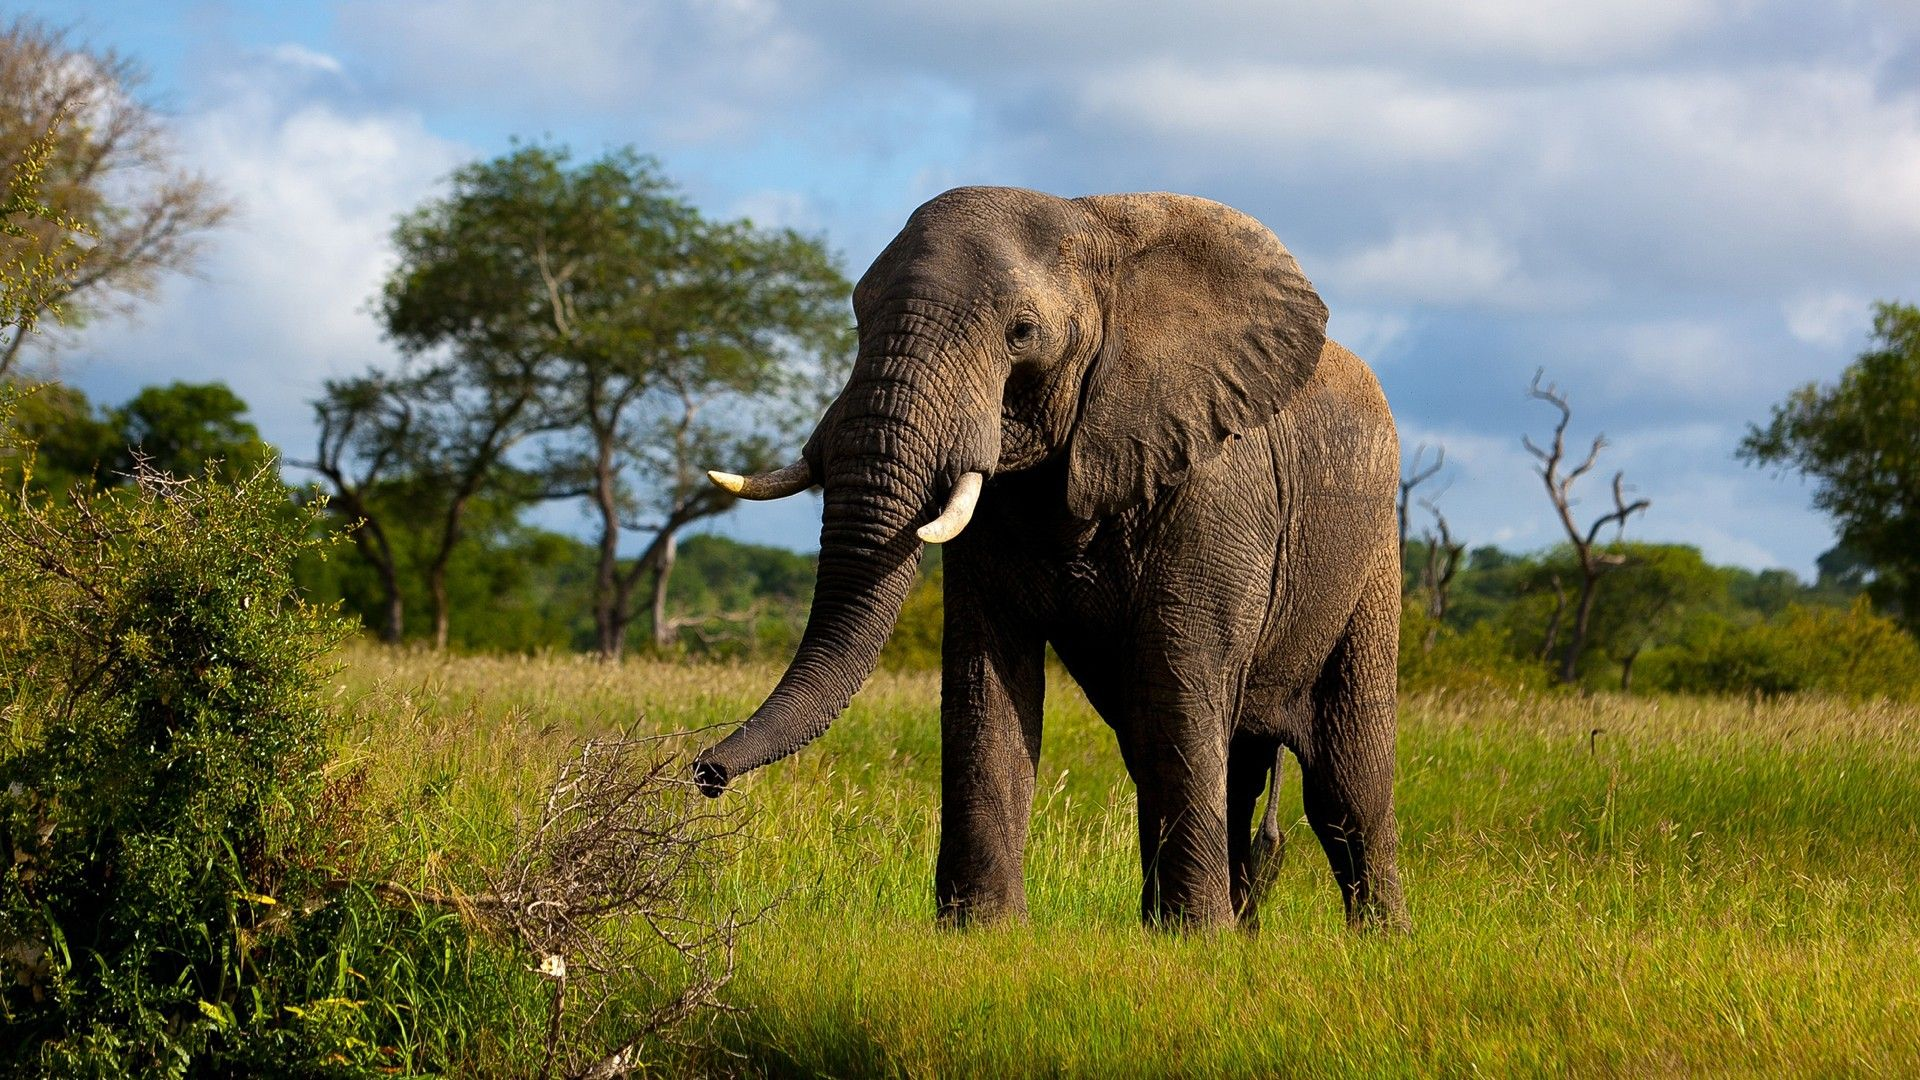 Wallpaper download elephant - Elephant Hd Wallpapers Free Download